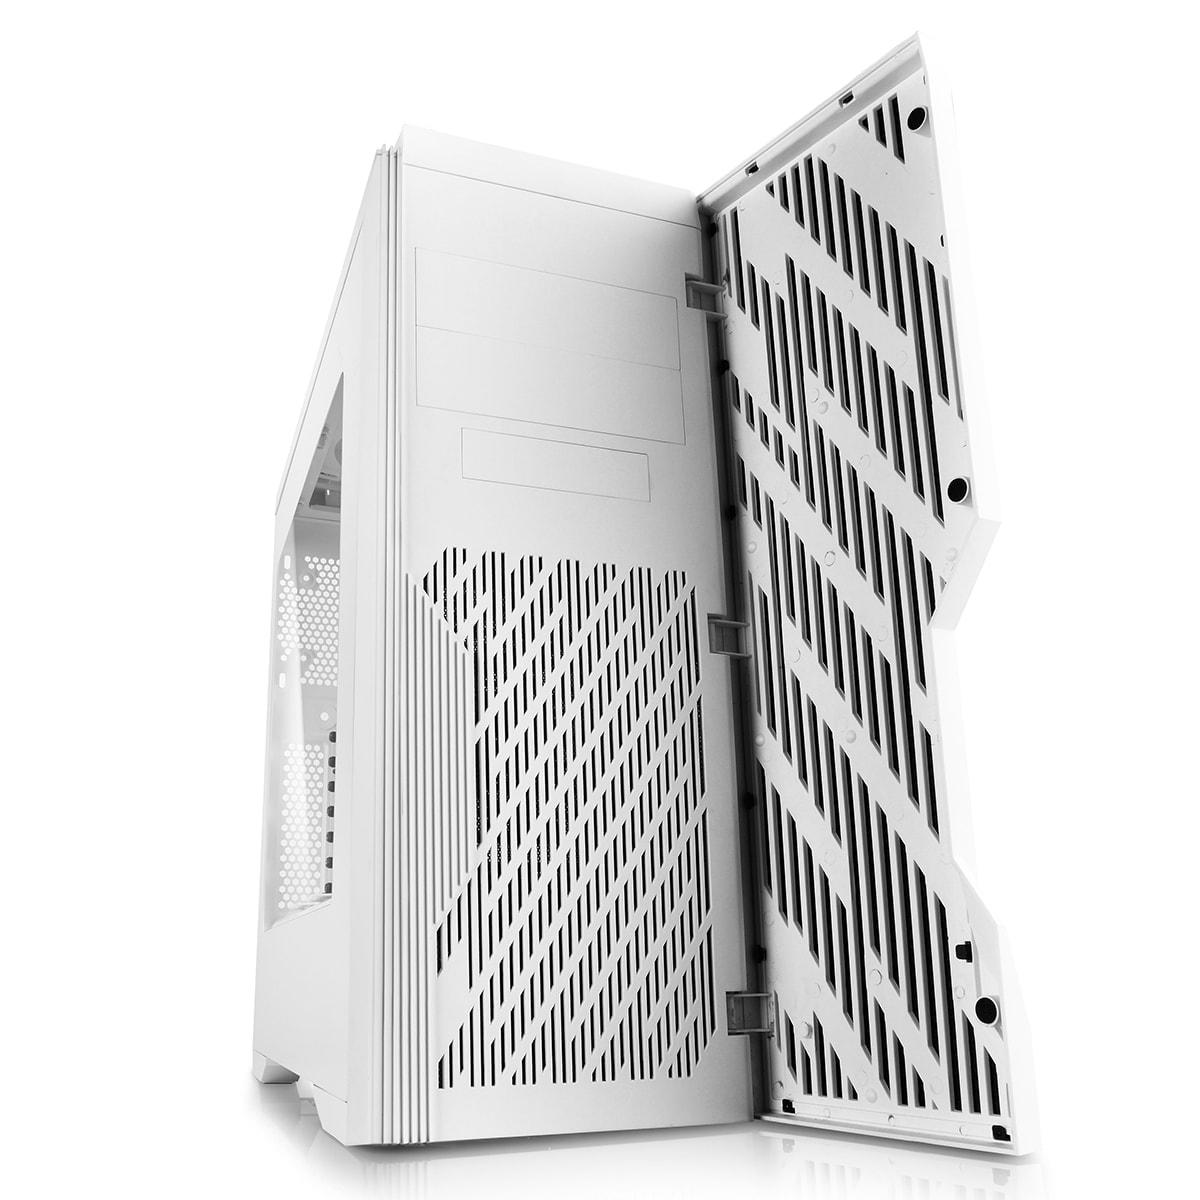 Deepcool mT/Ss Alim/ATX Blanc - Boîtier PC Deepcool - Cybertek.fr - 1